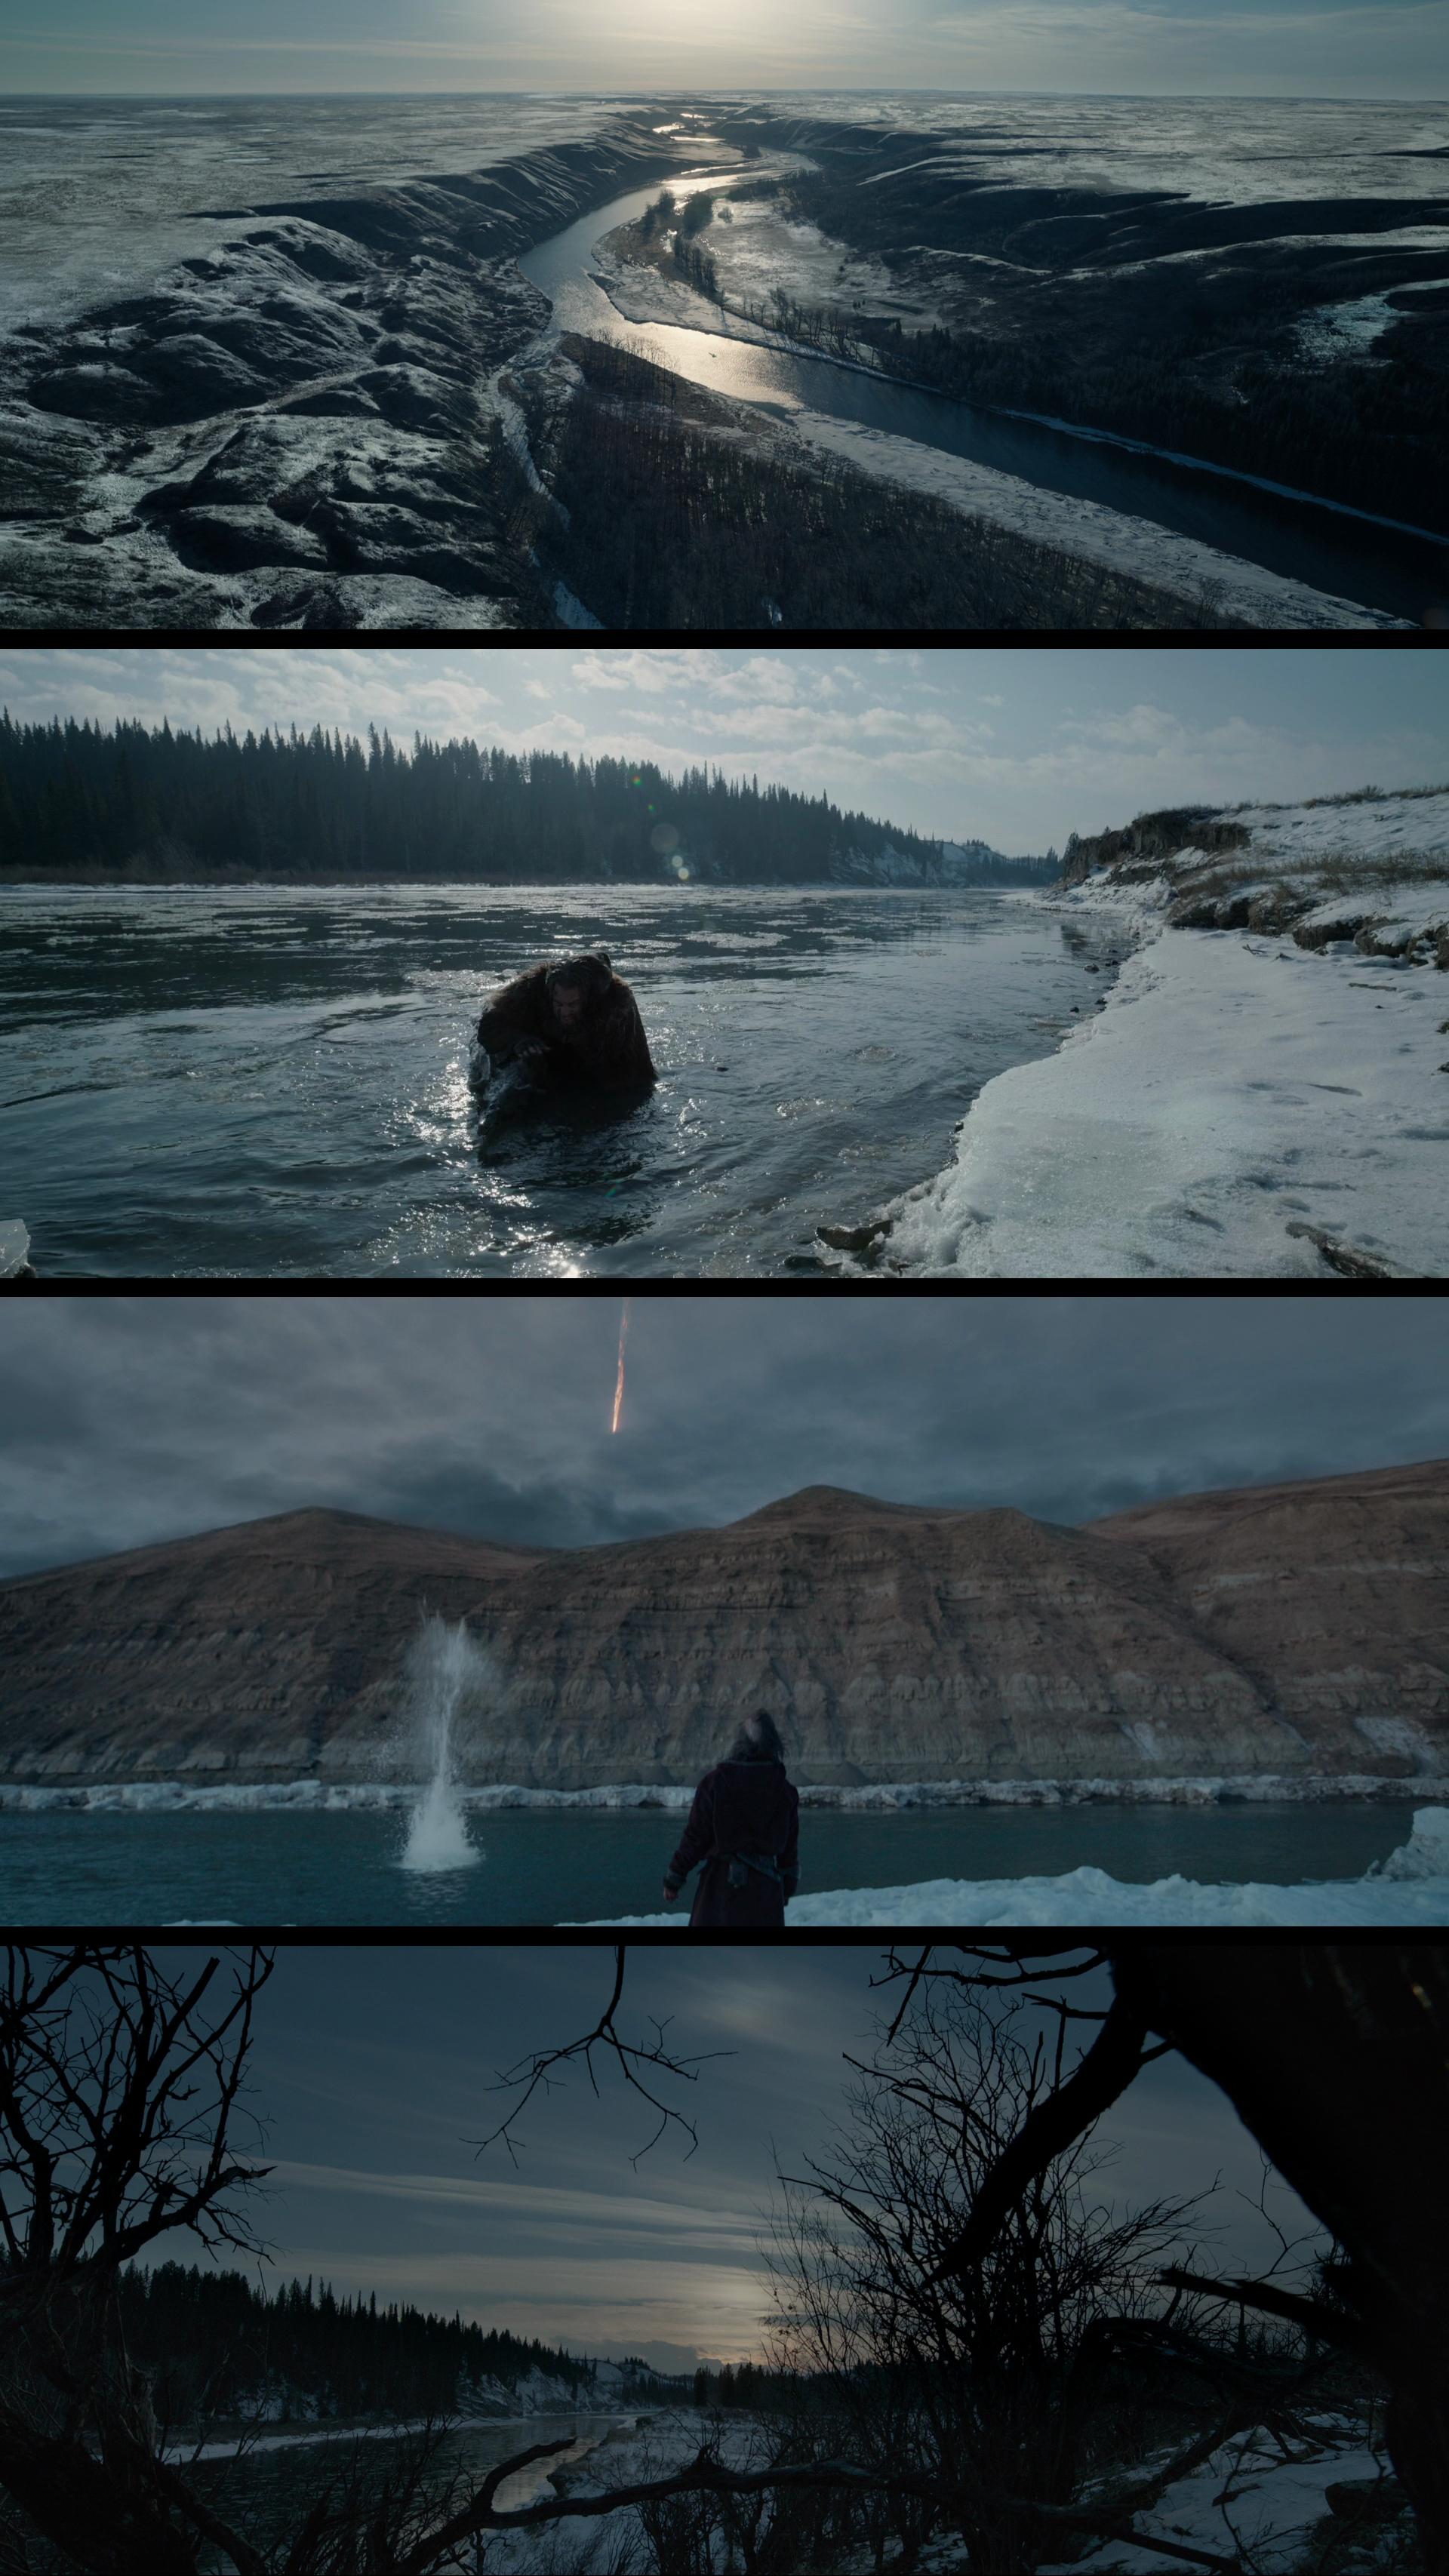 The Revenant by Alejandro Iñárritu - glorious landscapes (cinematographer Emmanuel Lubezki)